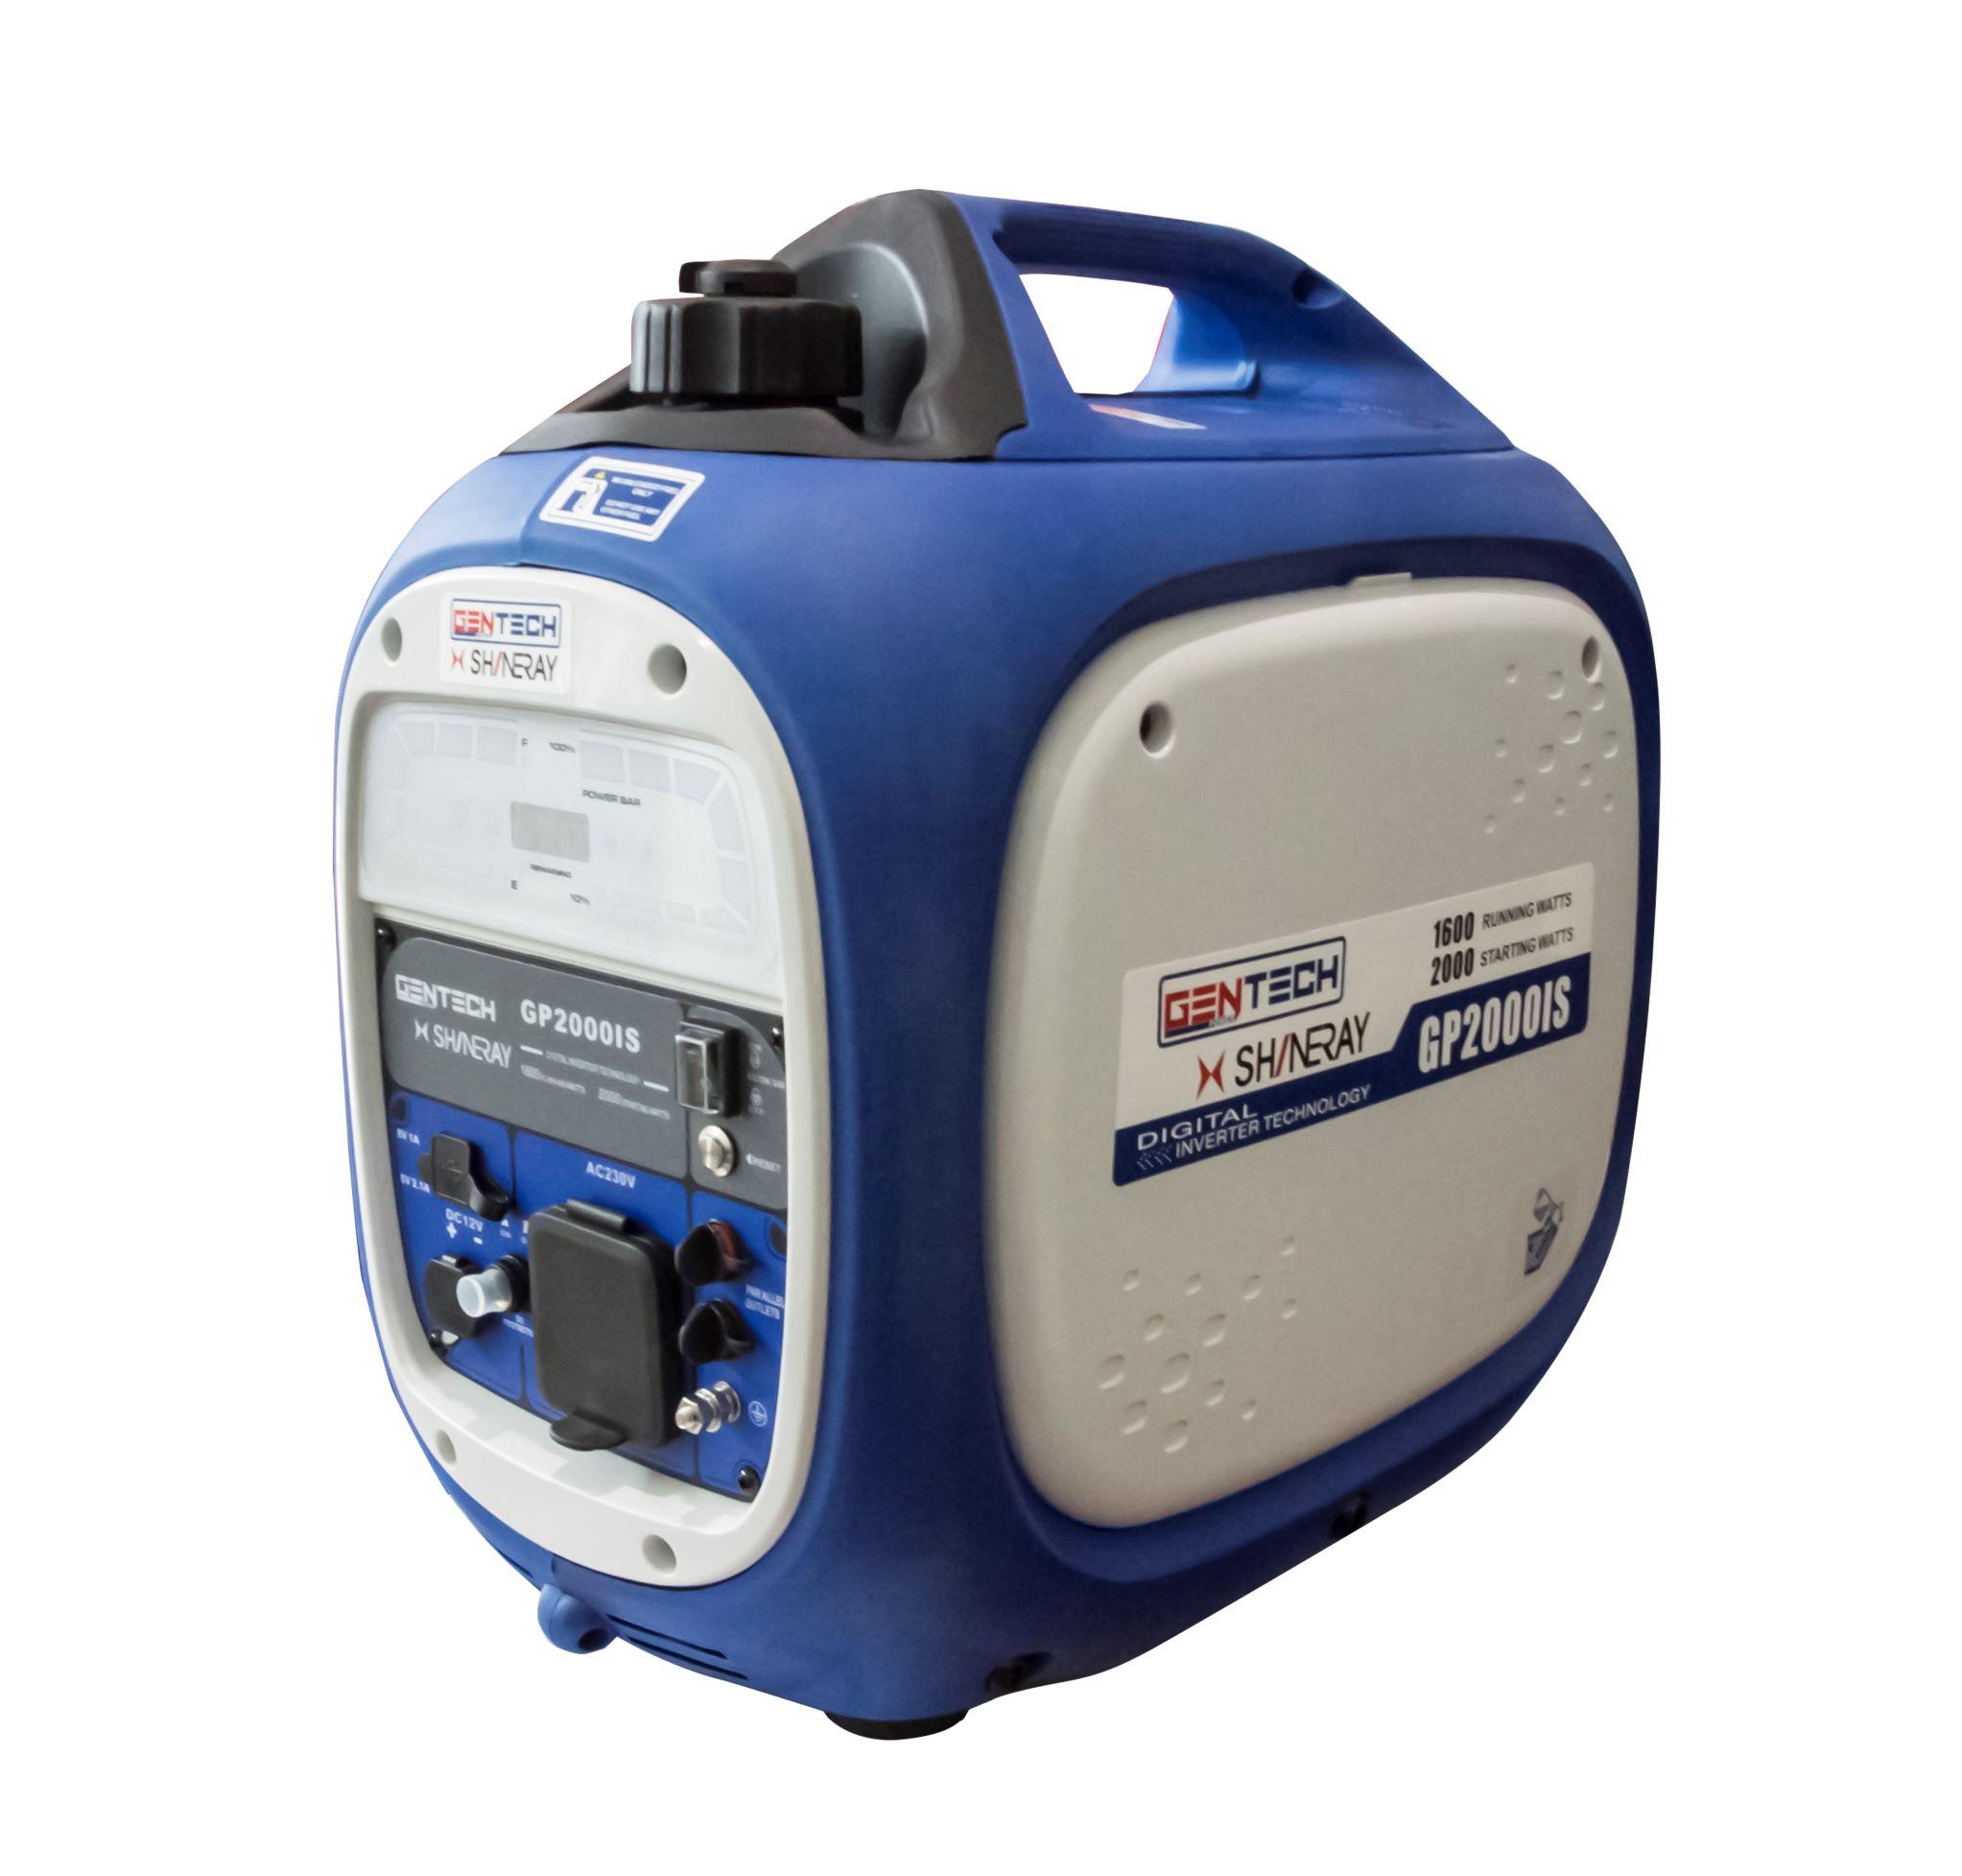 2KVA Pure Sinewave Recoil Start Inverter Generator